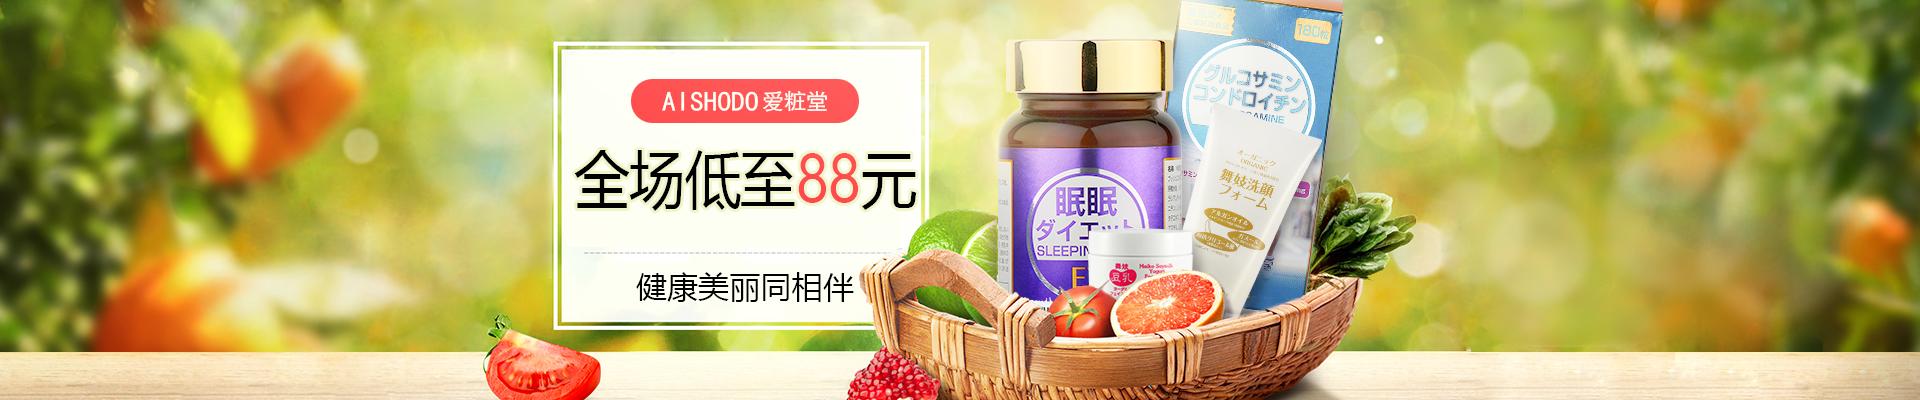 AISHODO 爱粧堂 健康美丽同相伴 全场低至88元